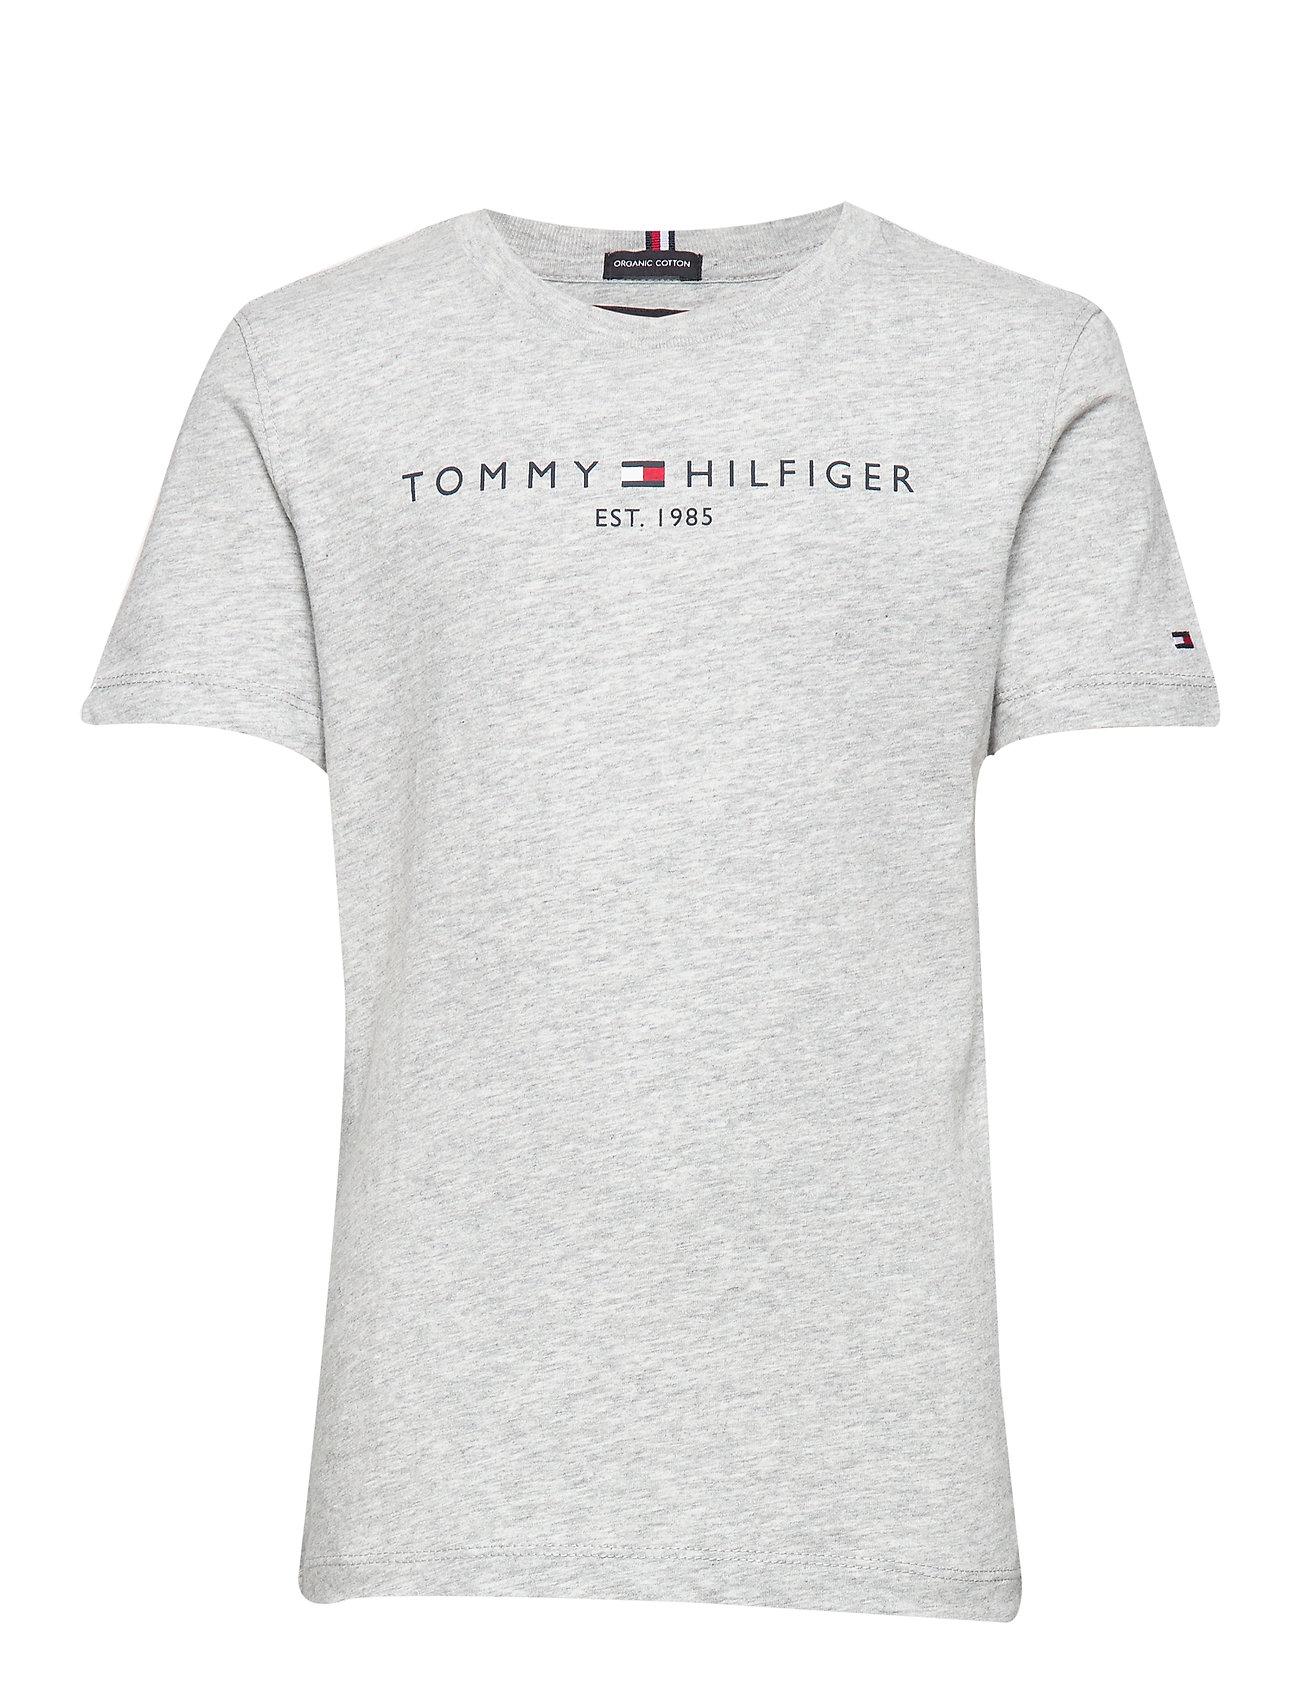 Tommy Hilfiger ESSENTIAL HILFIGER T - GREY HTR